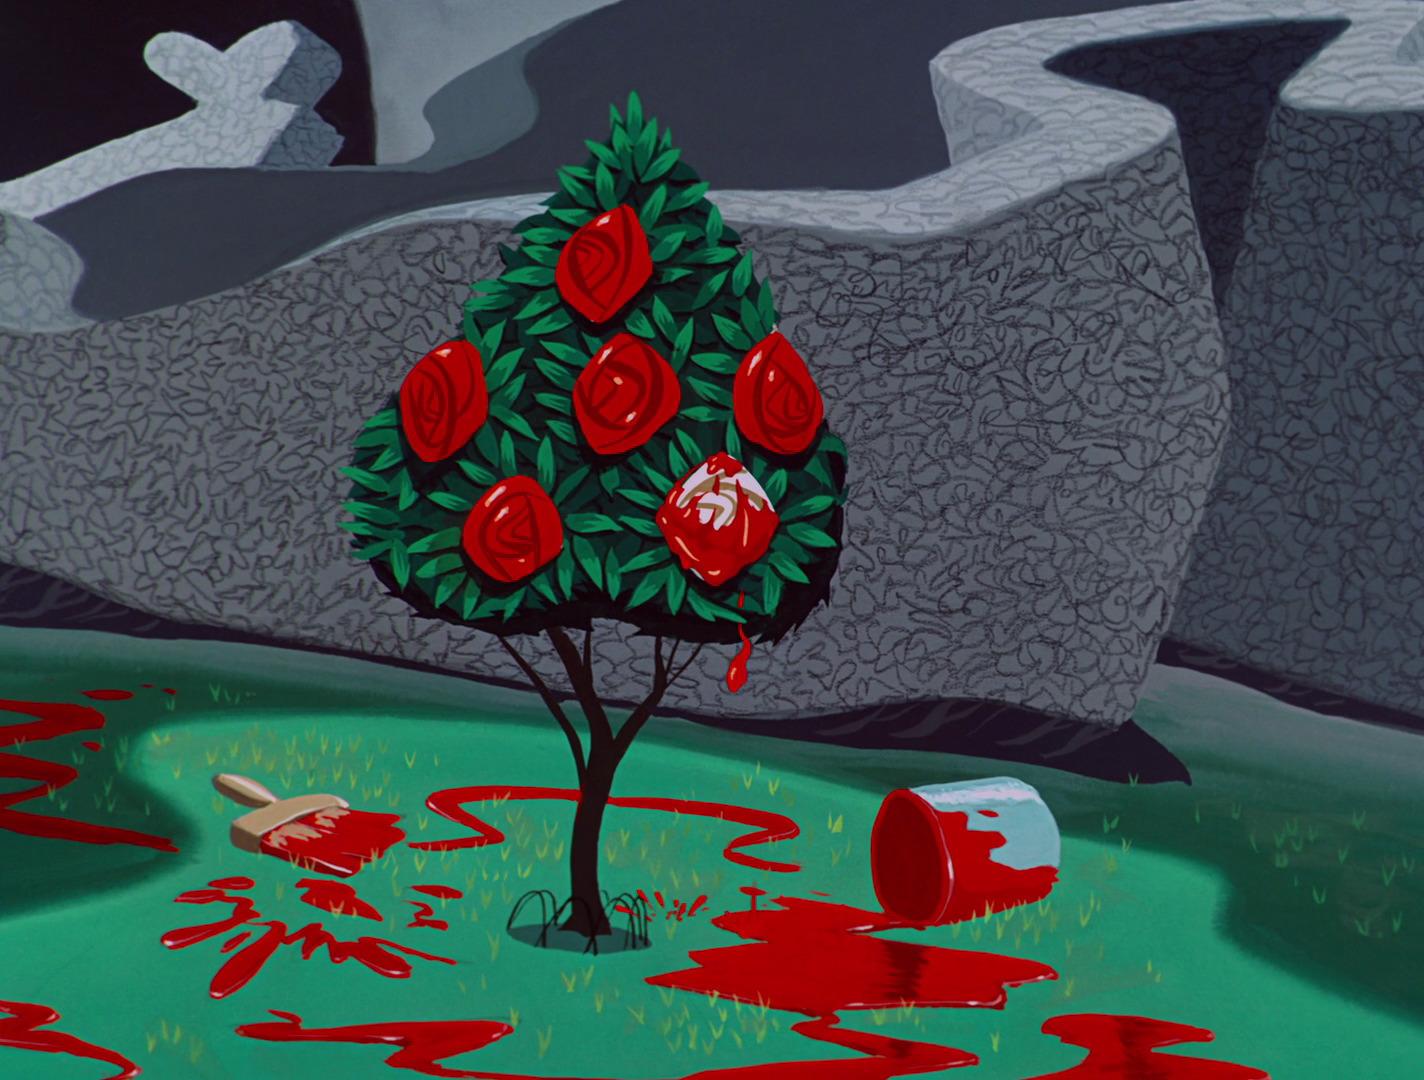 Drawn alice in wonderland rose #5